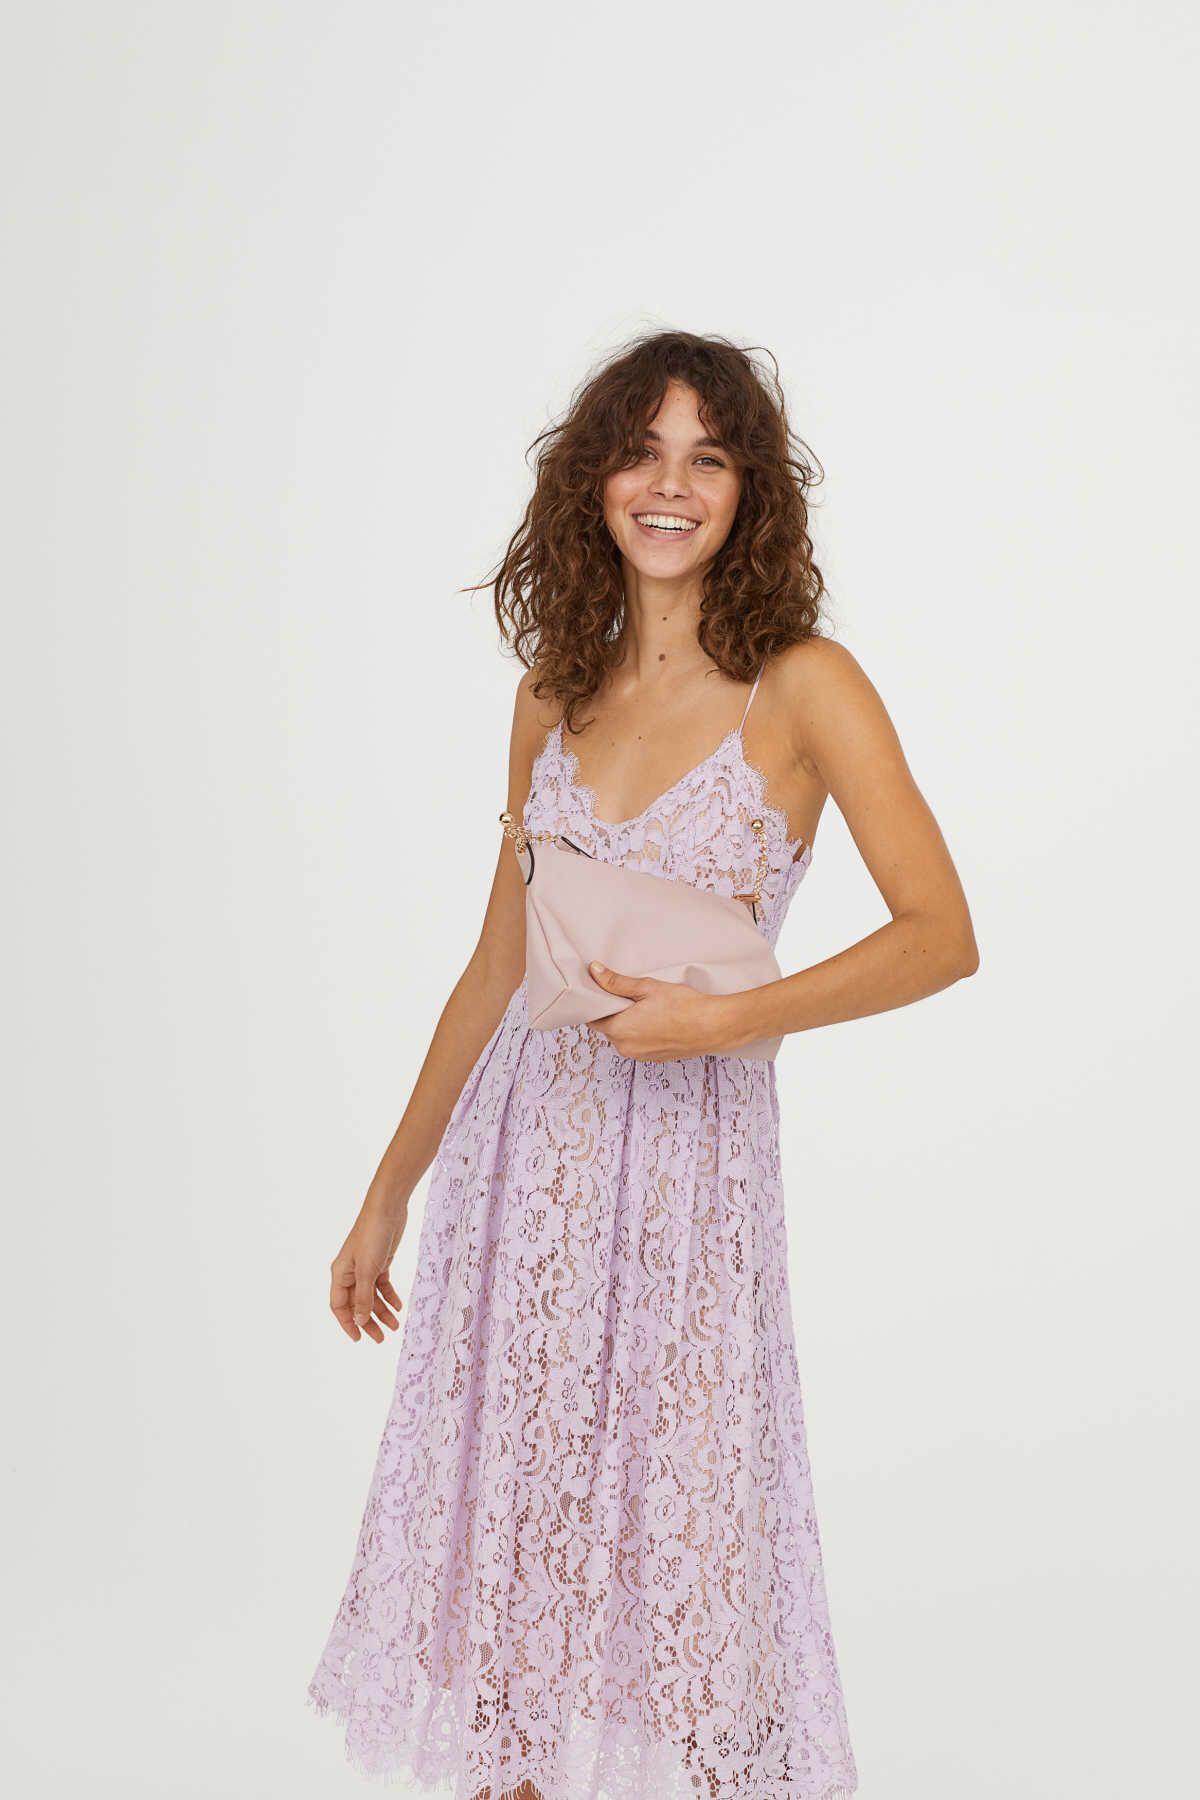 H&m lace dress white  Pin by Diana Glanville on dresses alone  Pinterest  Lace dress